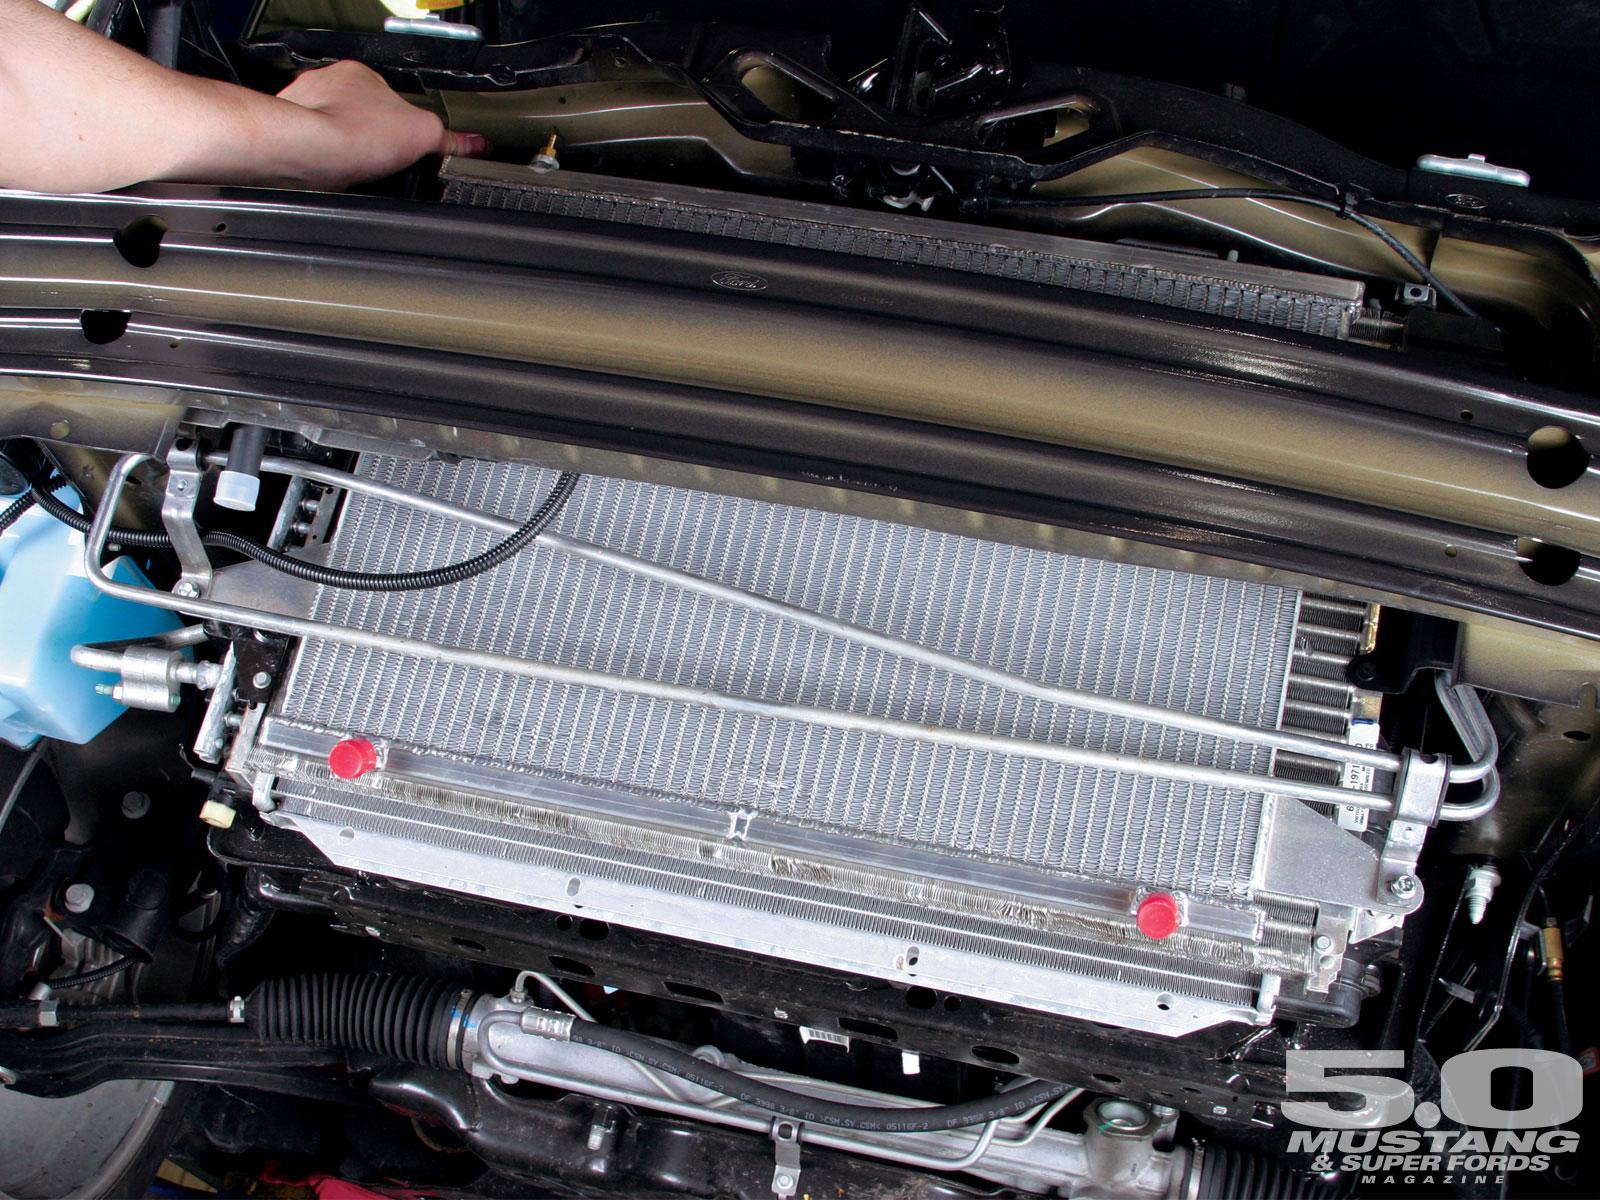 M5lp 0704 21 O Magnacharger Intercooled Supercharger Intercooler Heat Exchanger